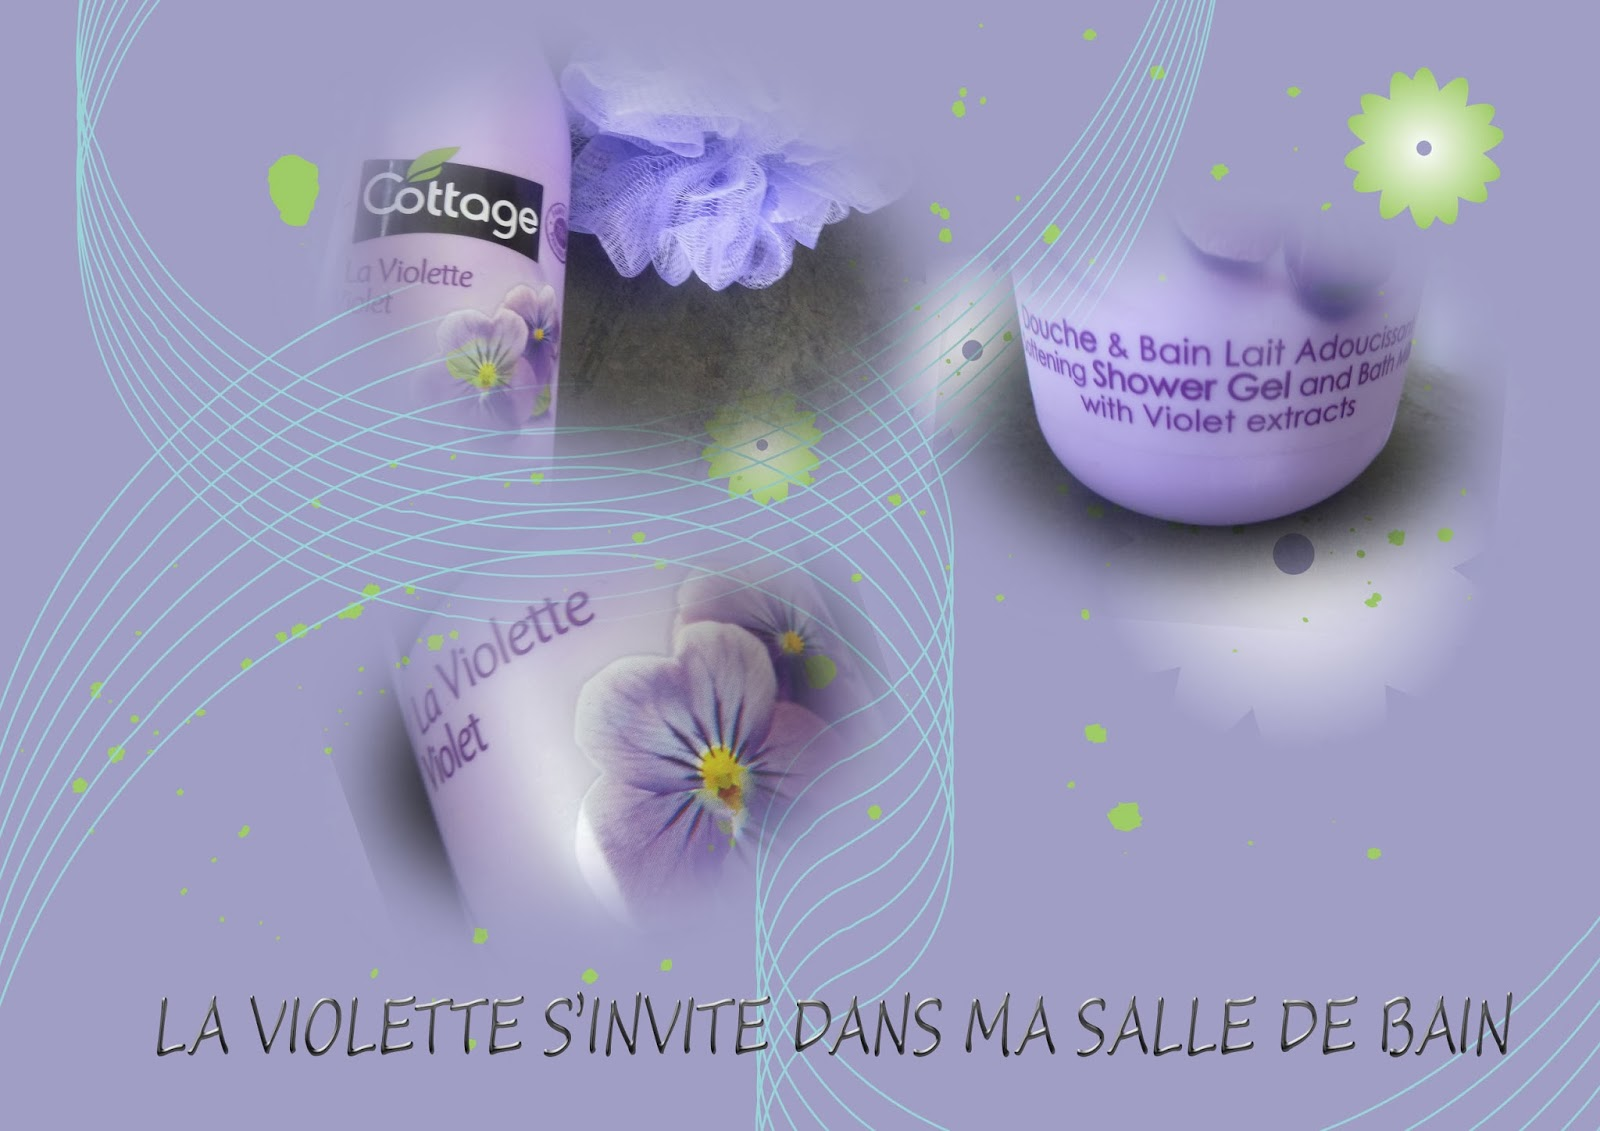 la violette s invite dans ma salle de bain lesenviesdetalie